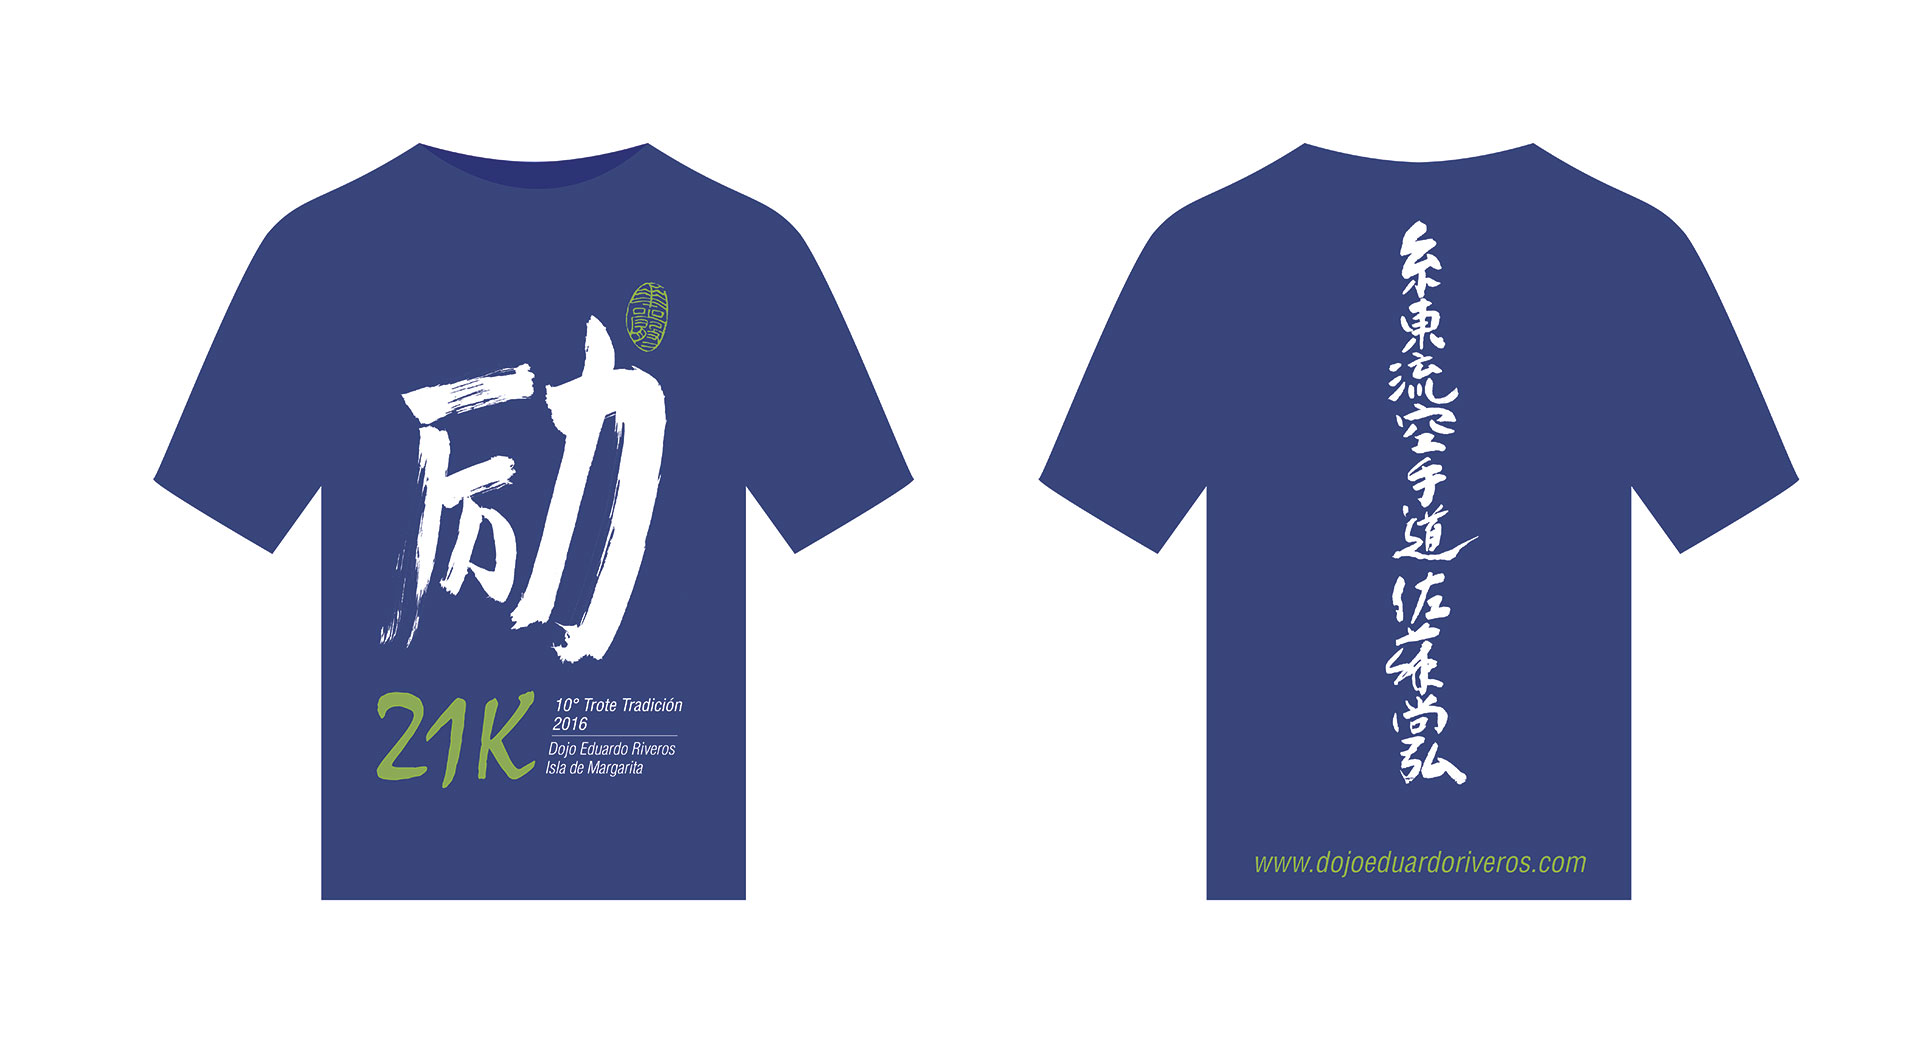 camisa-trote-21k-2016